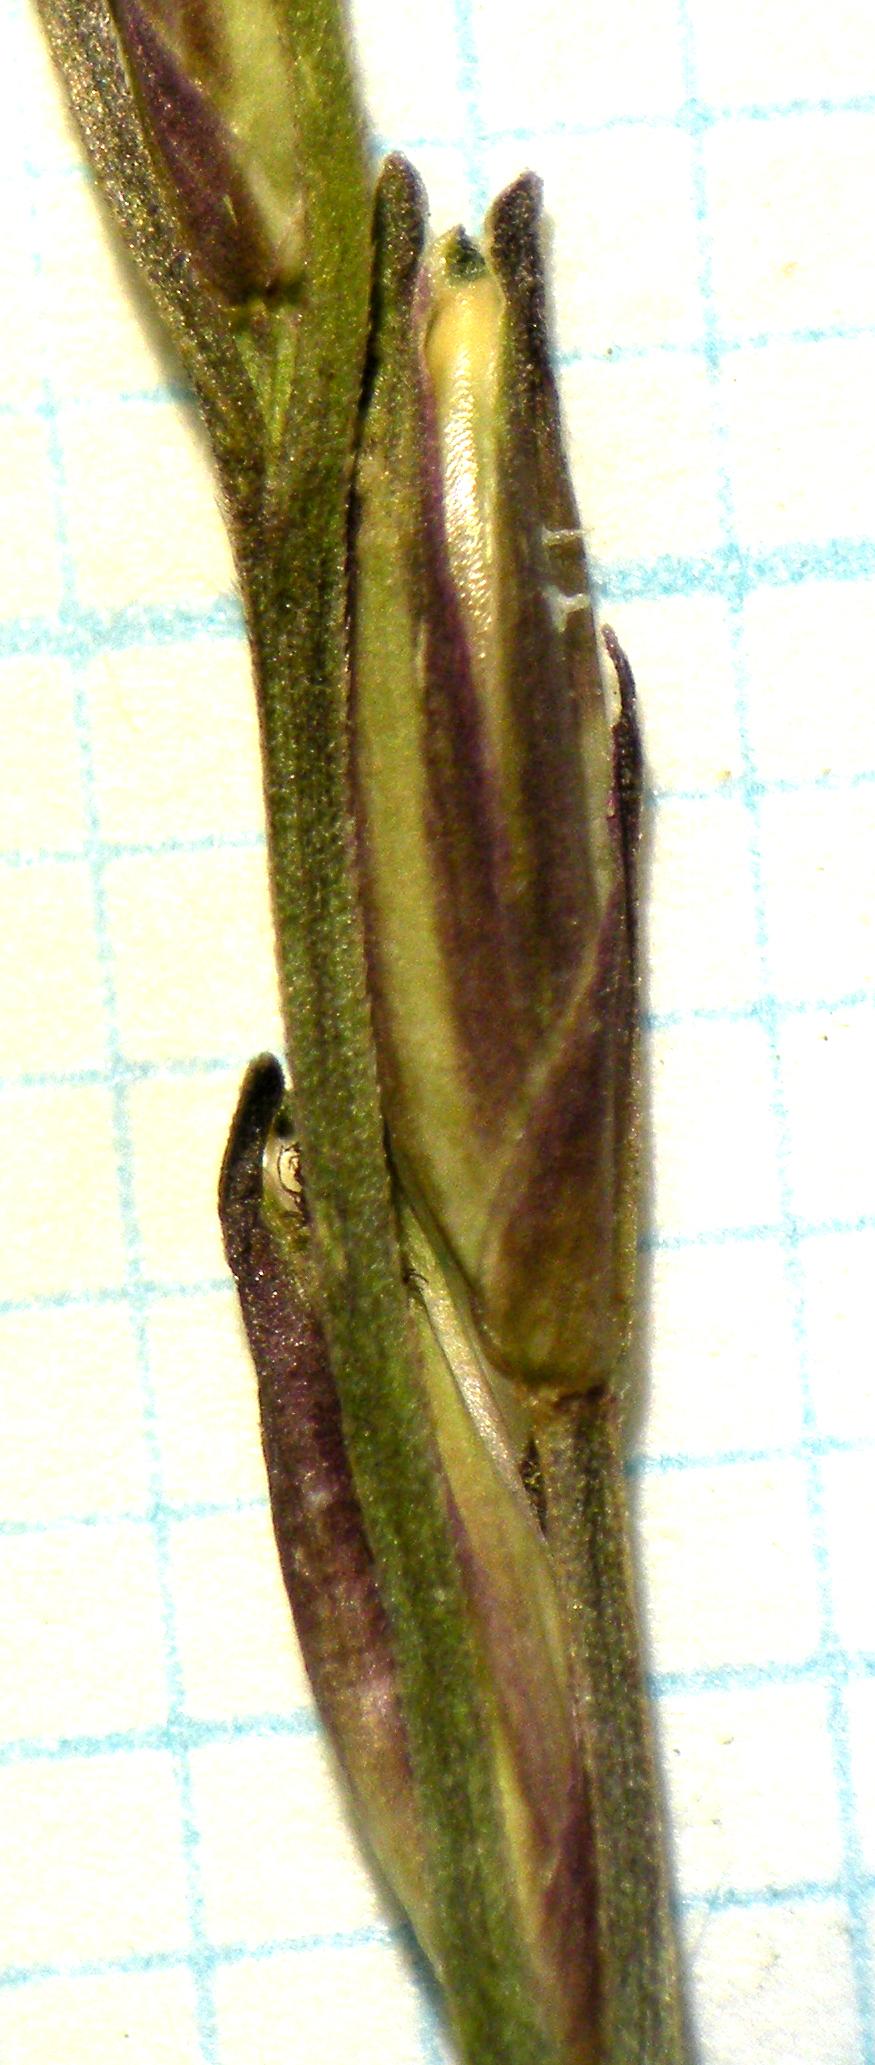 小穂(目盛1mm)